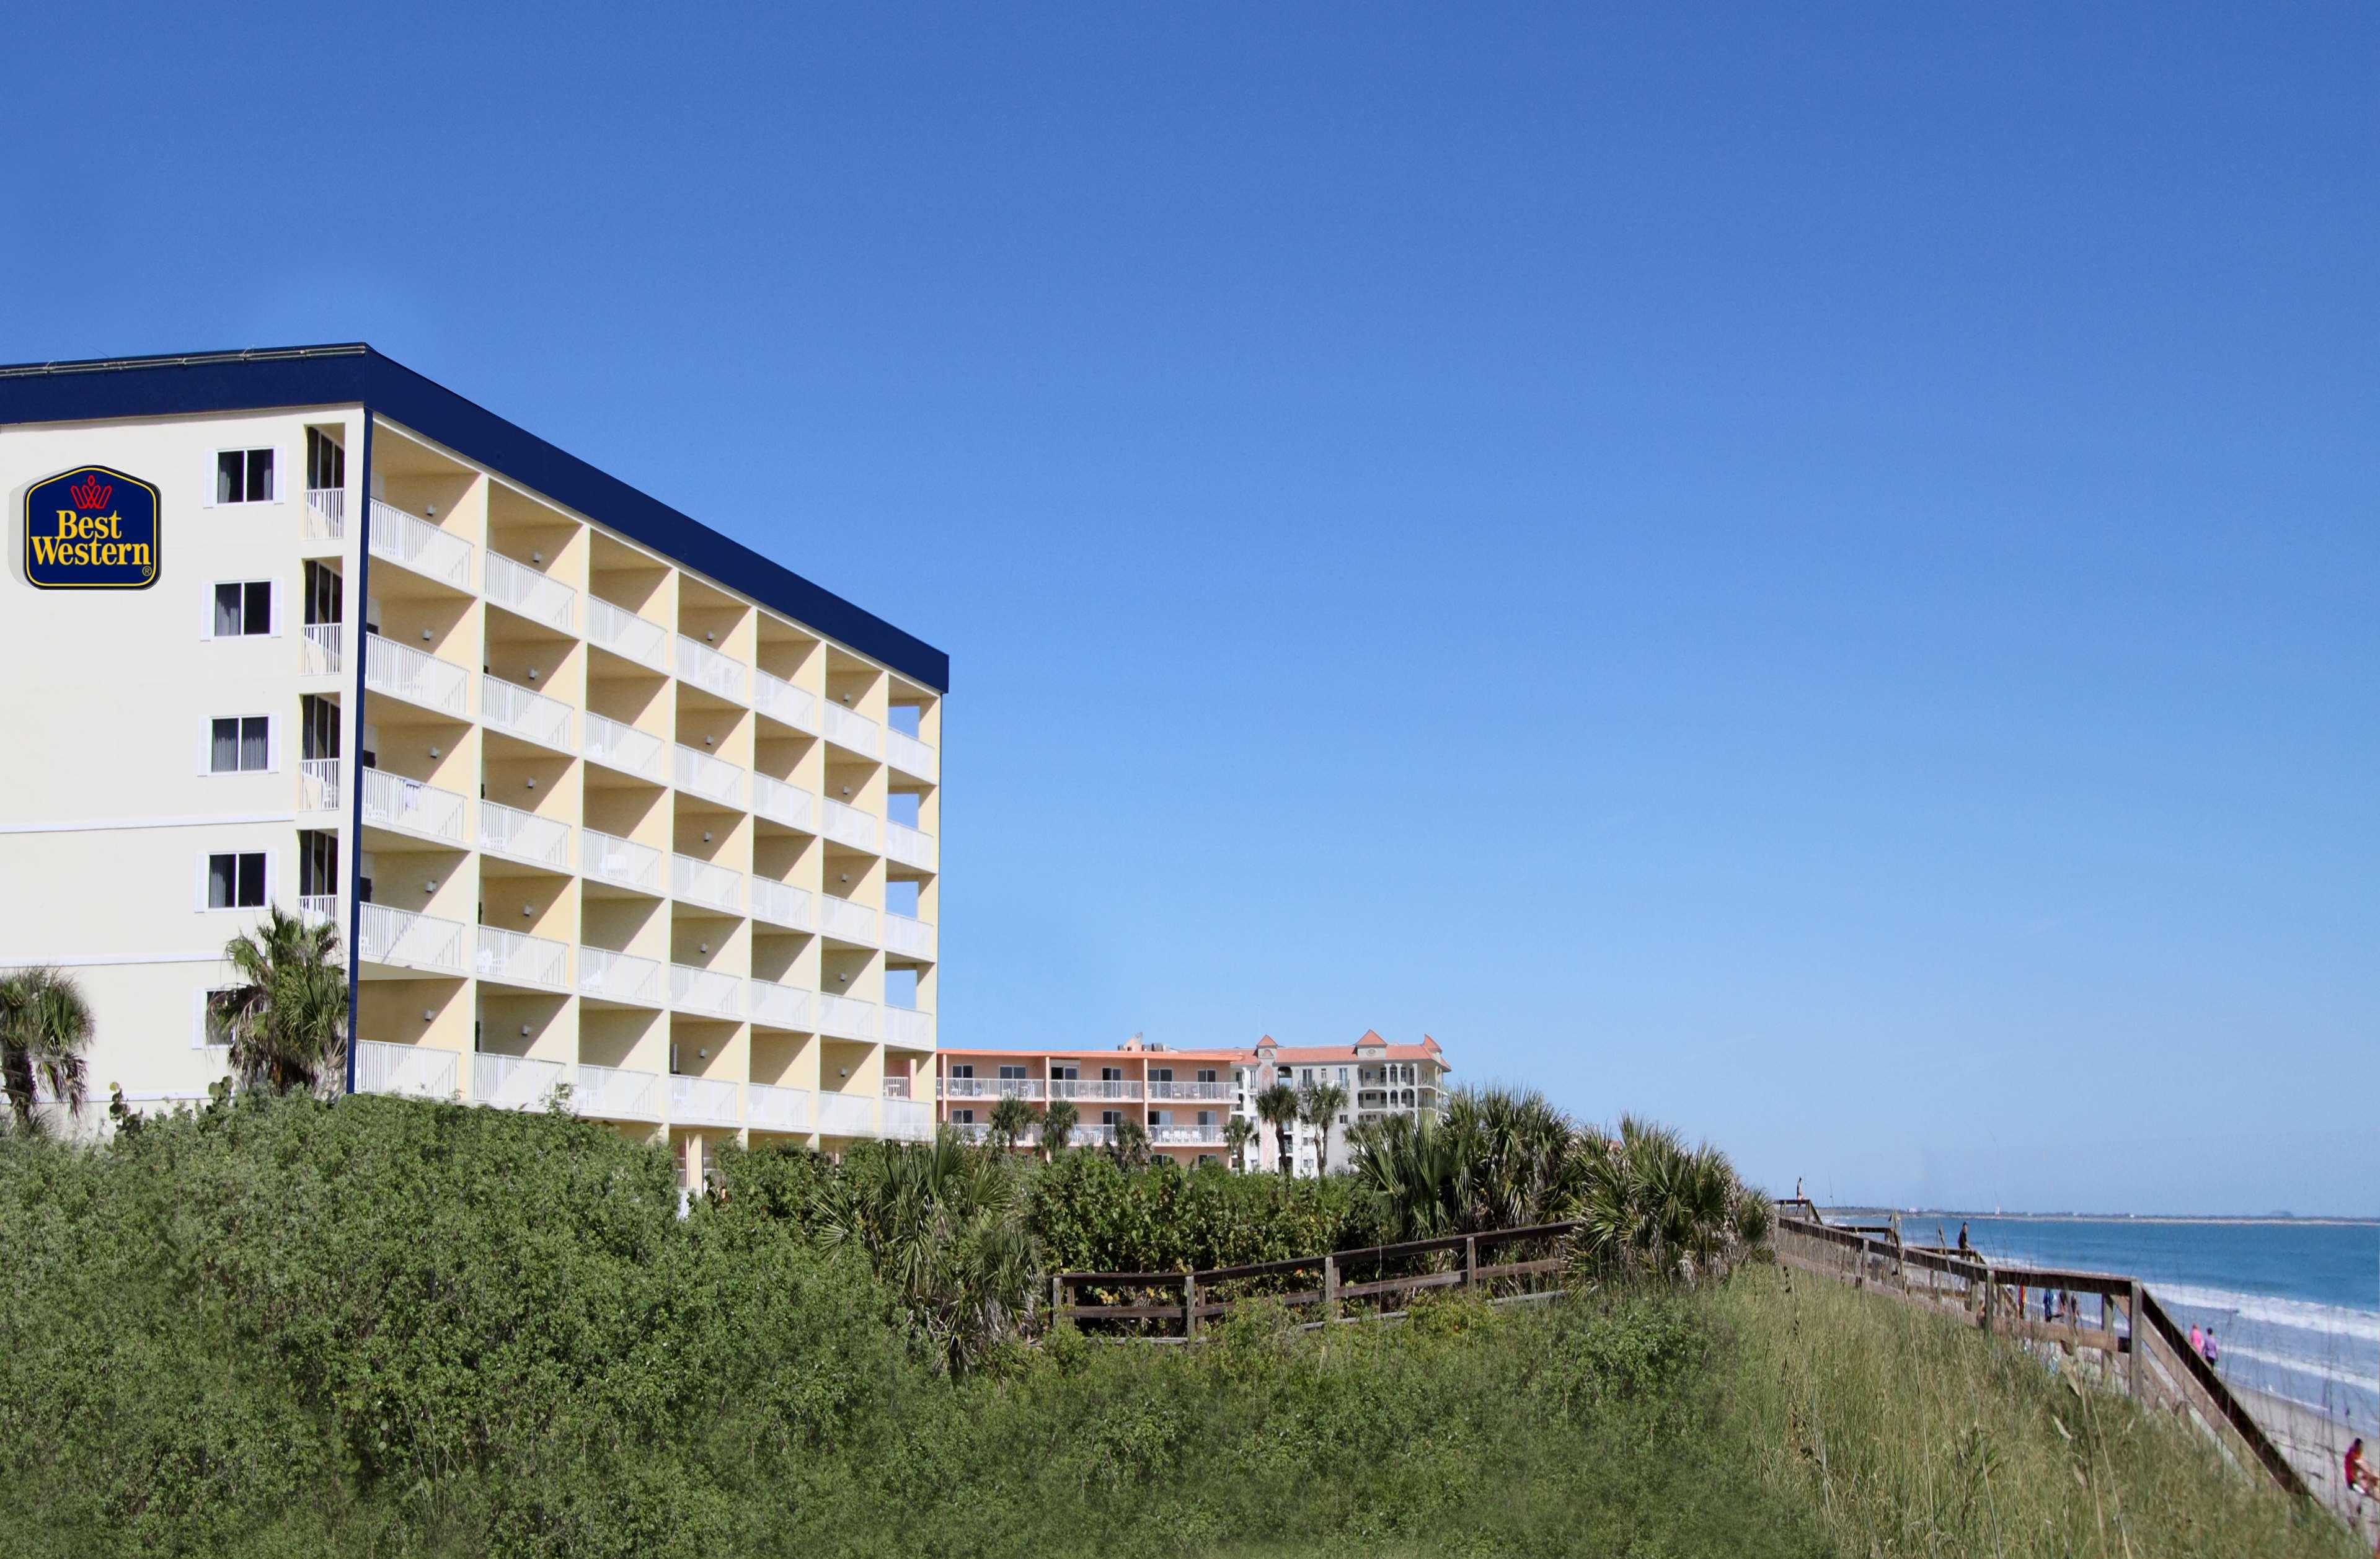 Best Western Hotels Near Cocoa Beach Fl